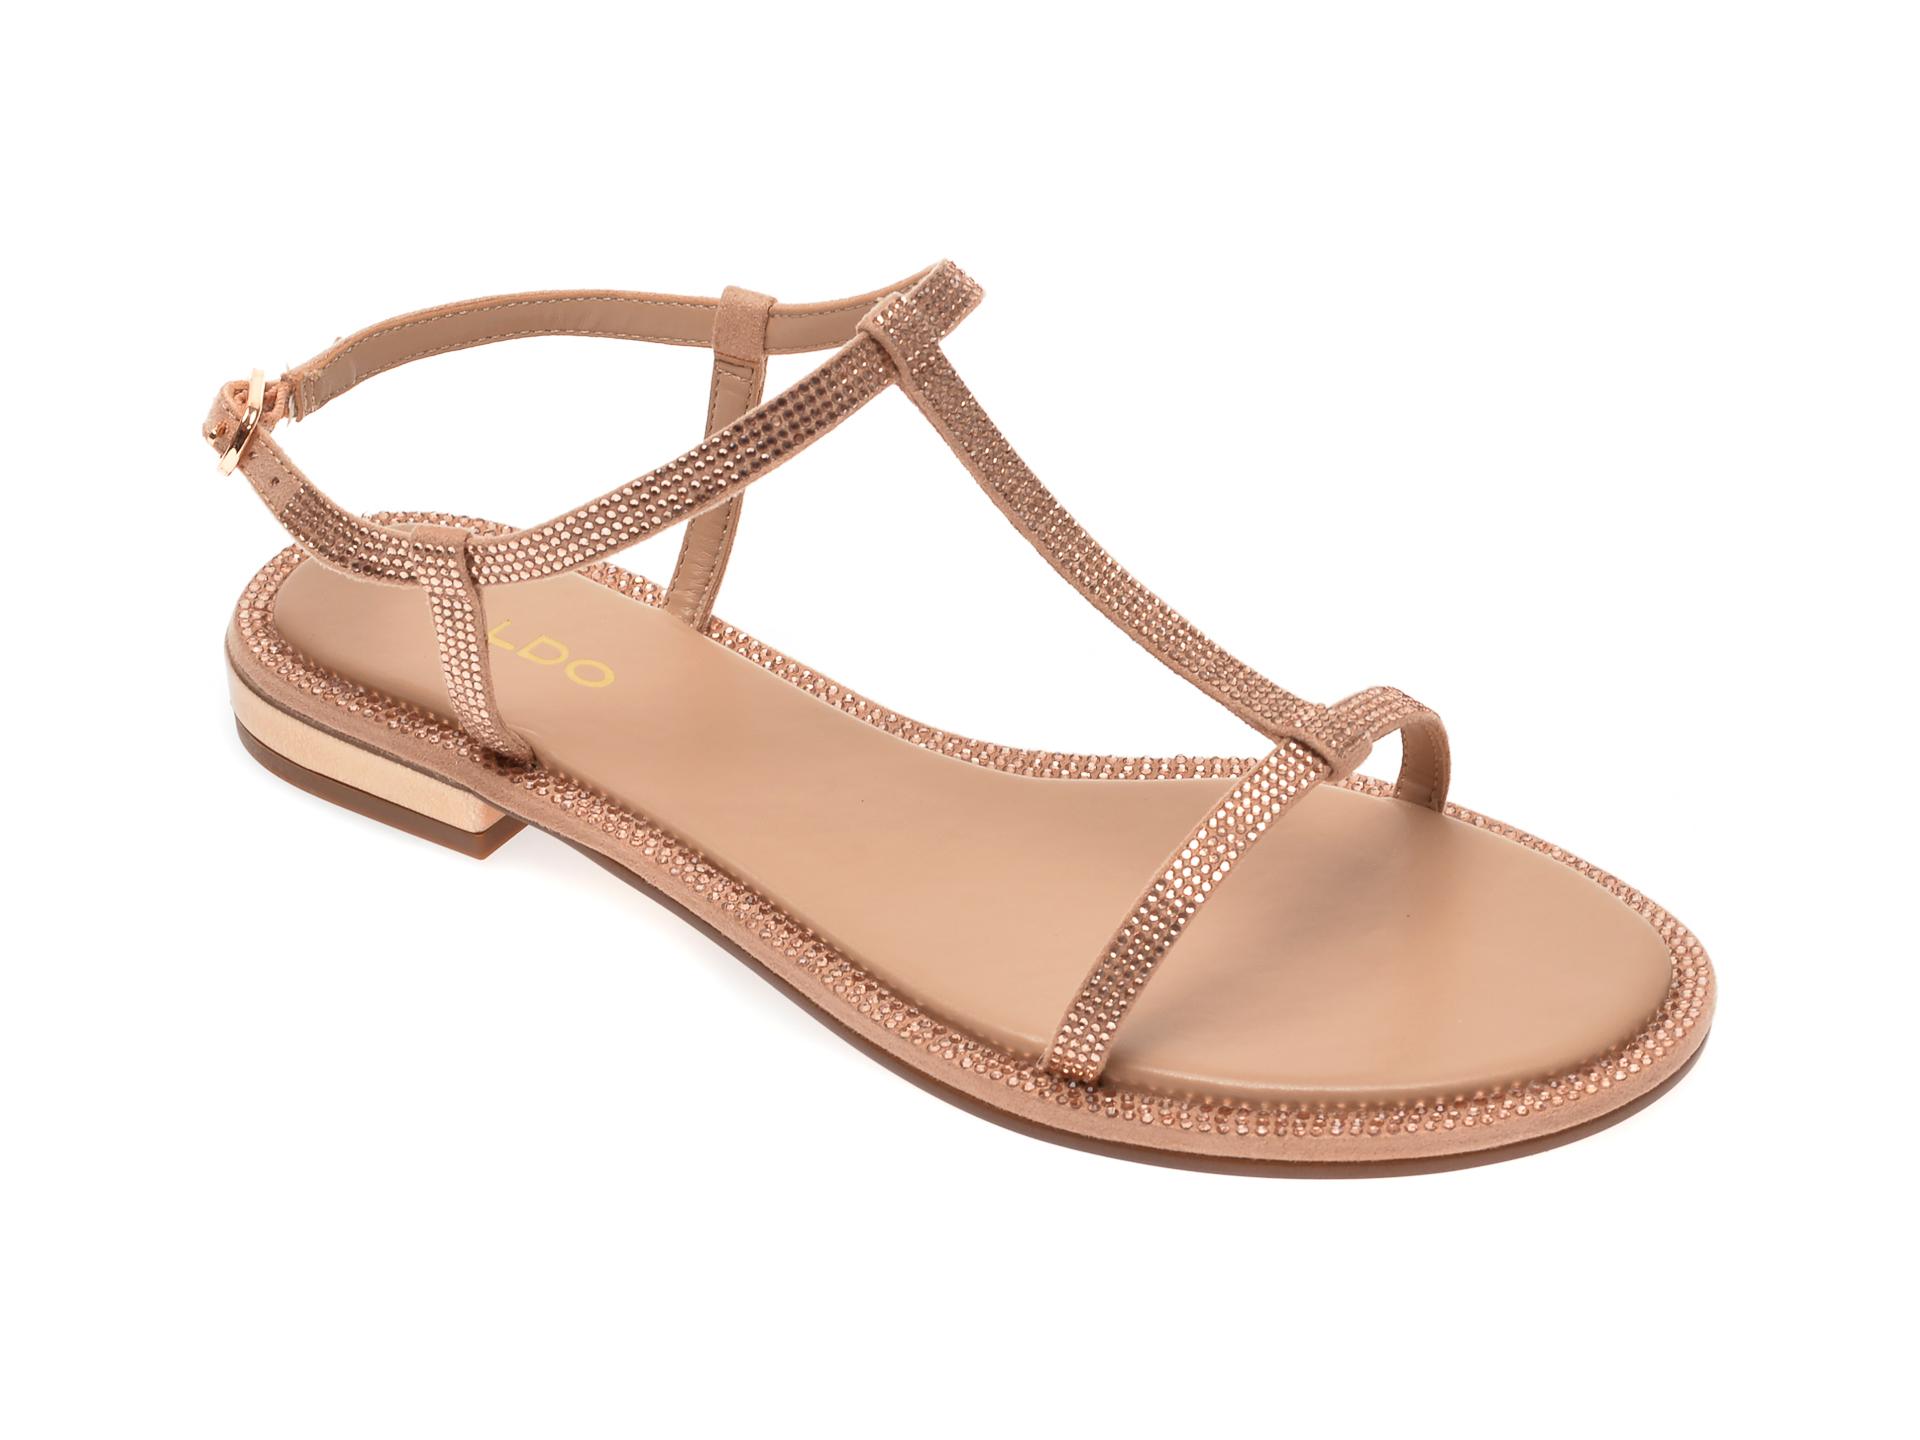 Sandale ALDO aurii, Yboimma653, din material textil